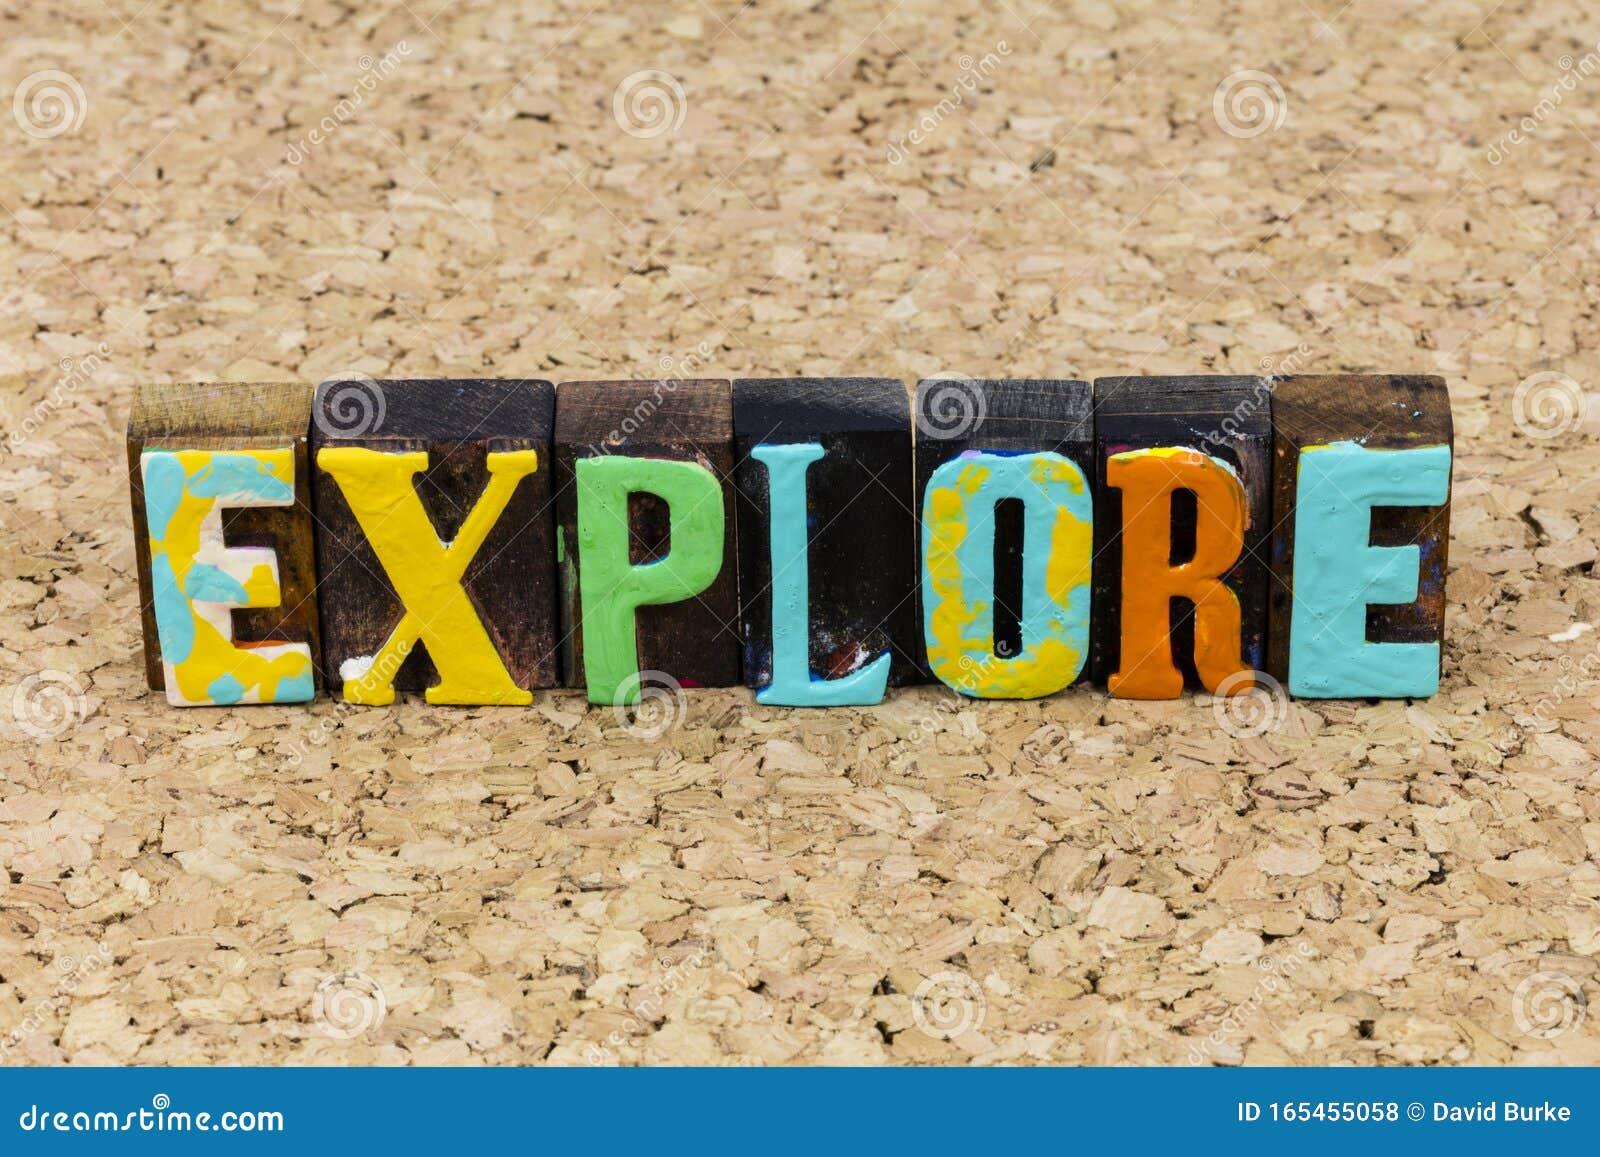 Explore Exploration Travel Adventure Journey Discovery ...